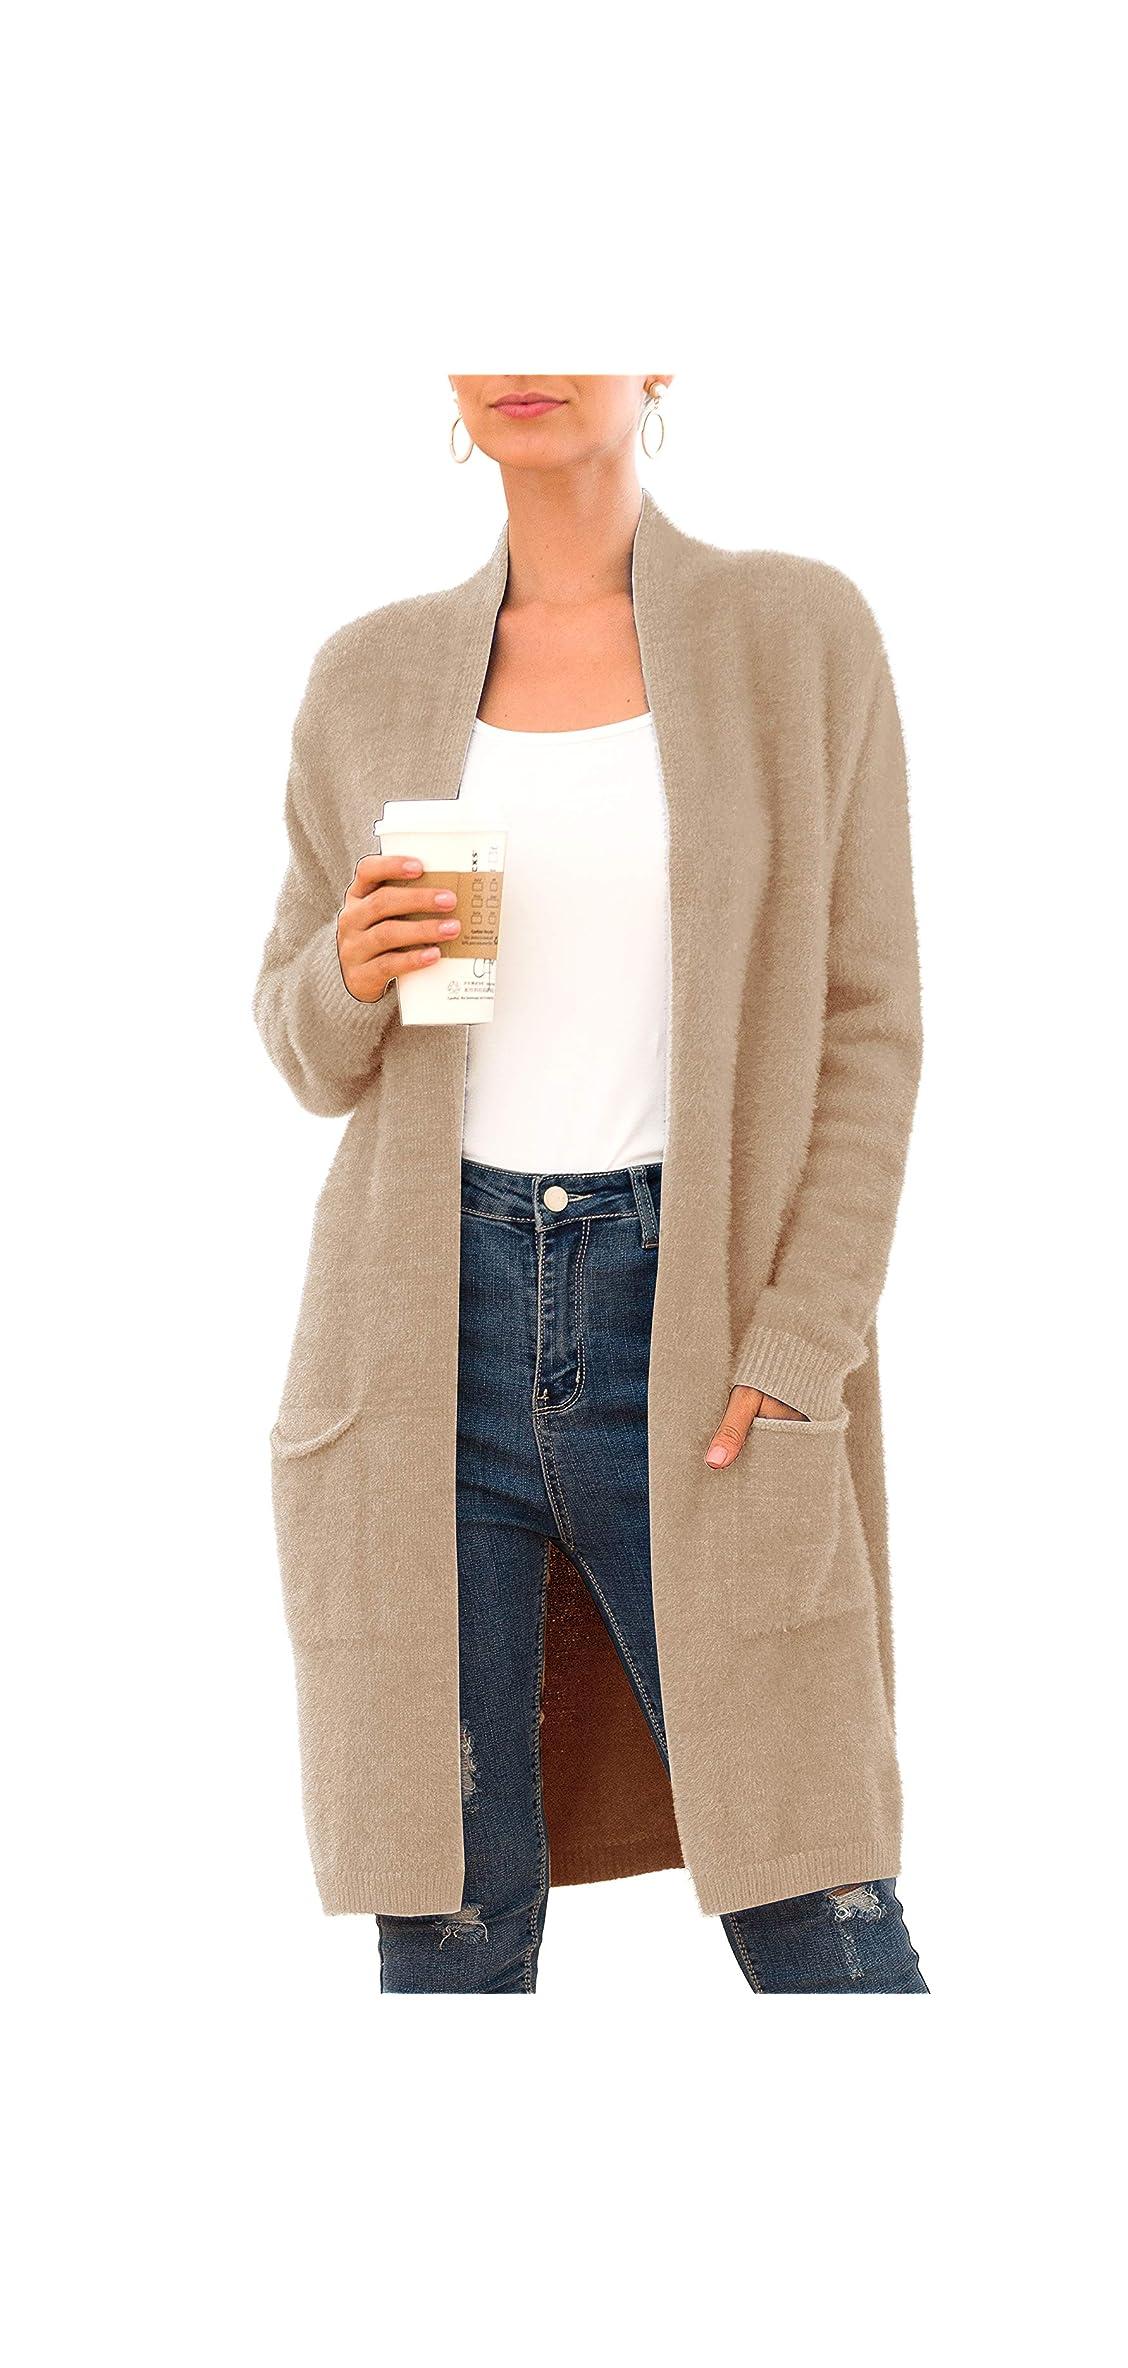 Women's Casual Open Front Knit Cardigans Long Sleeve Coat